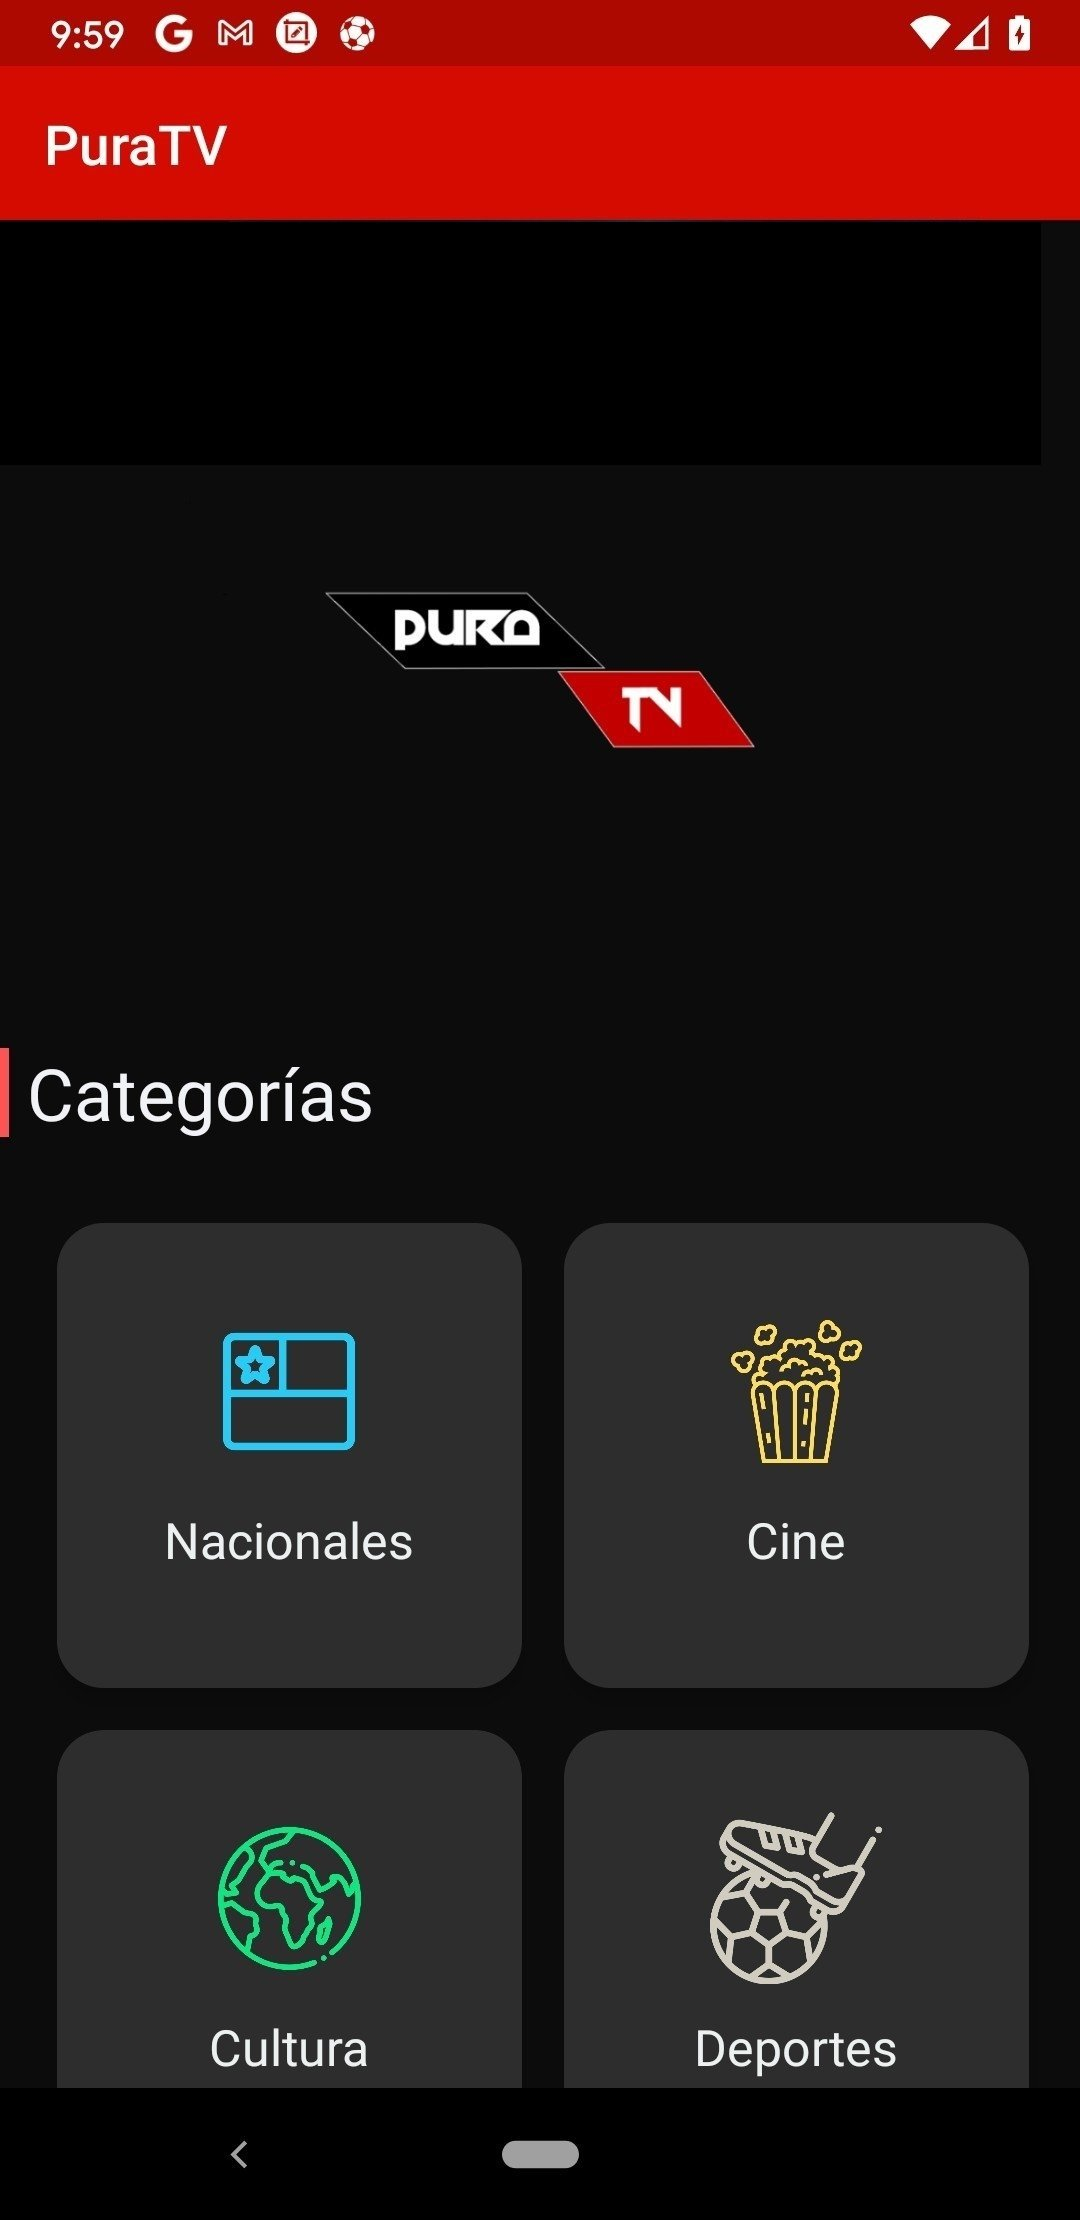 PuraTV 3 3 5 - Descargar para Android APK Gratis